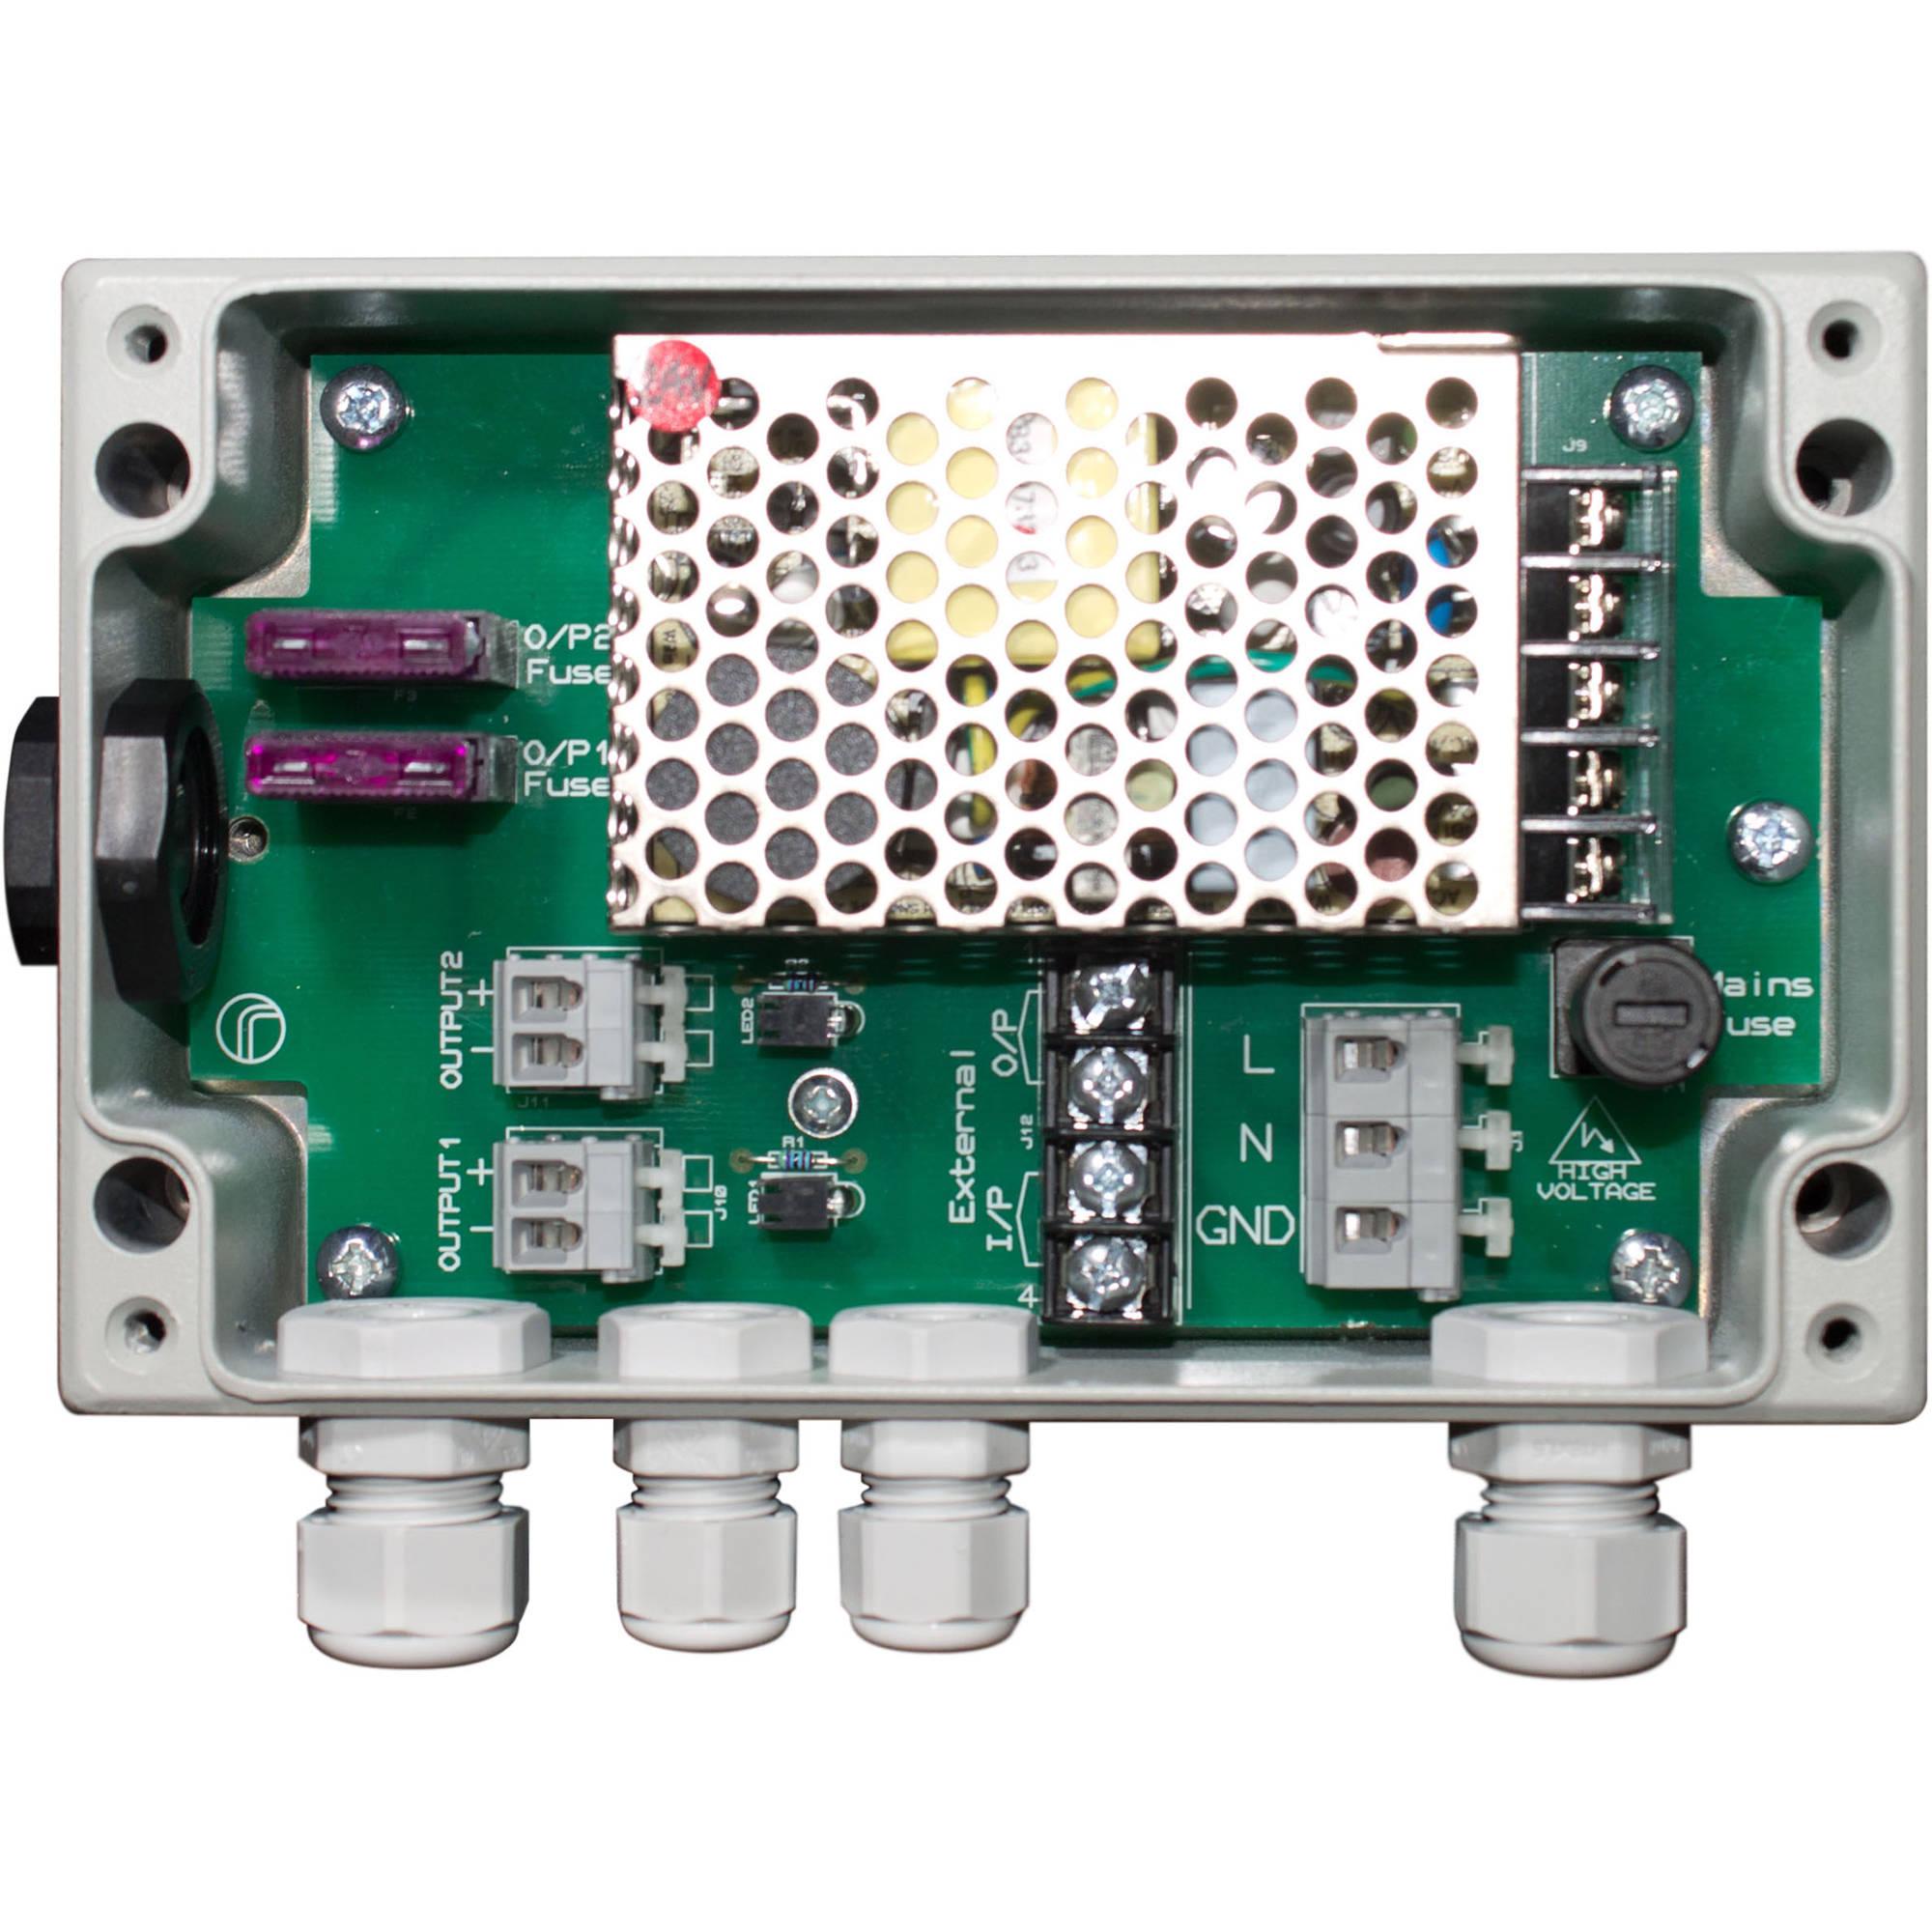 Https C Product 1331225 Reg Rain Sound Effects Generator Circuit Voice Recorder Raytec Var Psu 1x2 Vario Power Supply For 1300061